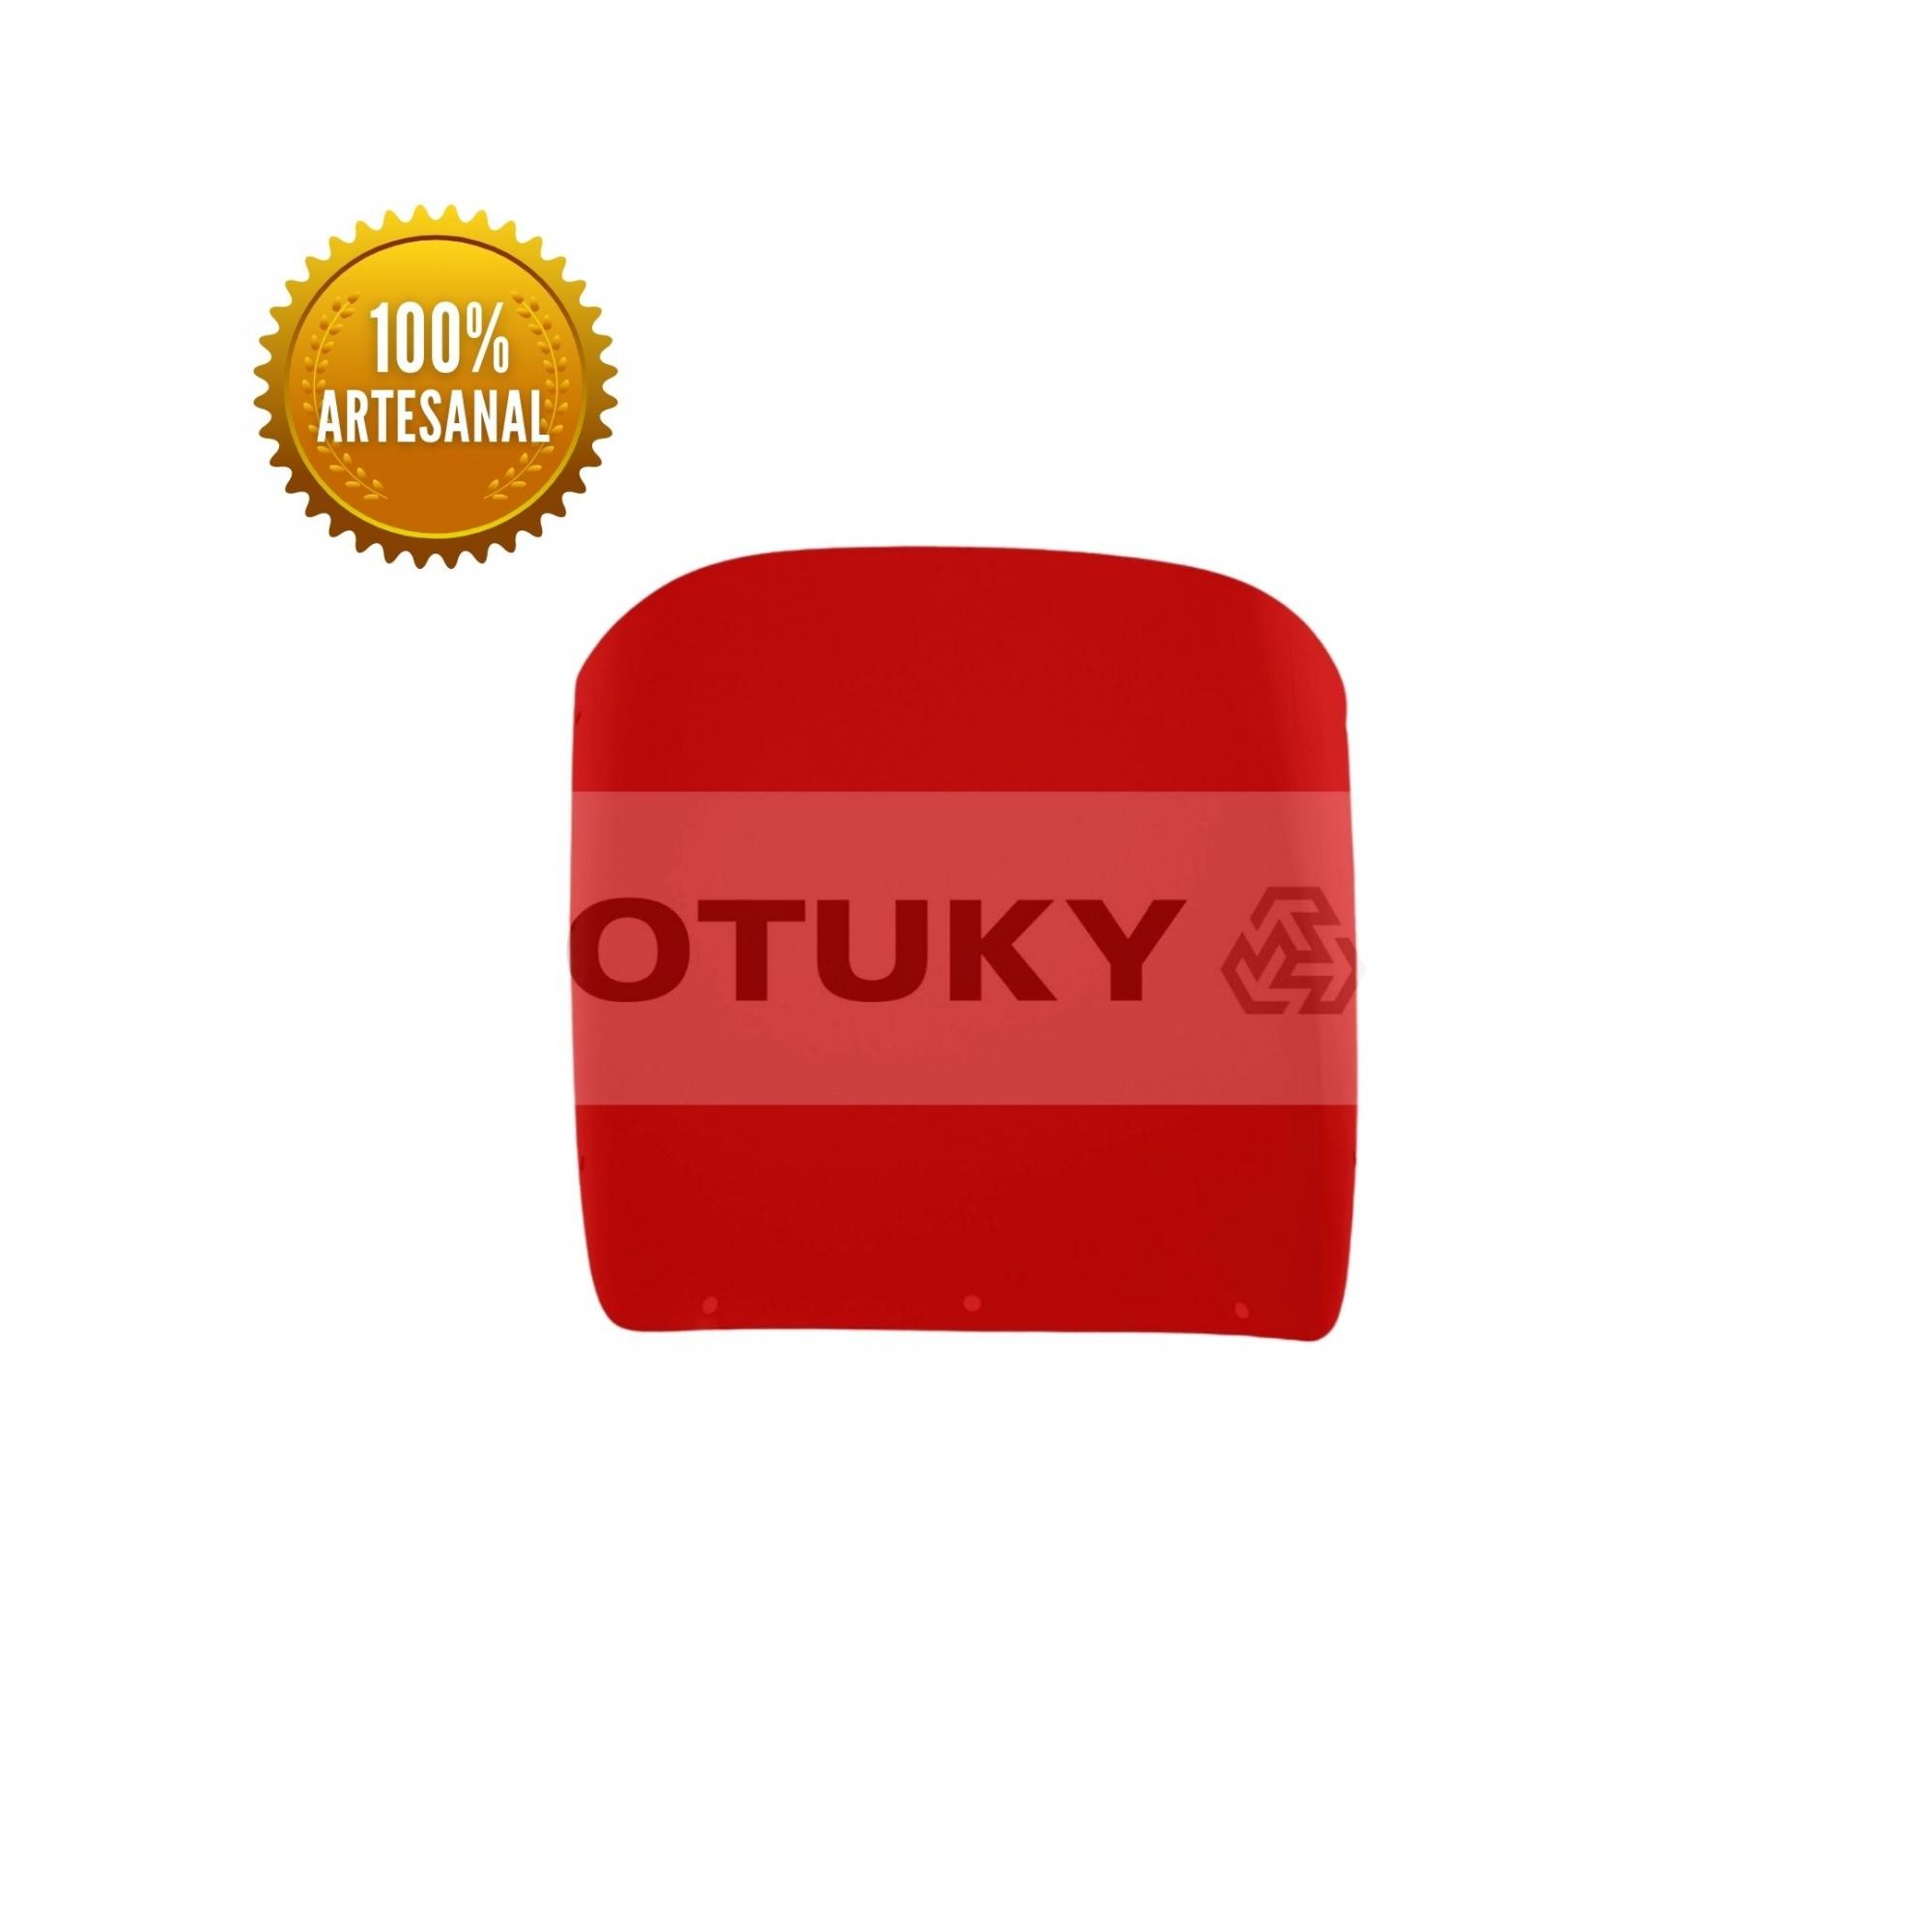 Bolha para Moto RDZ 135 Otuky Padrão Vermelho